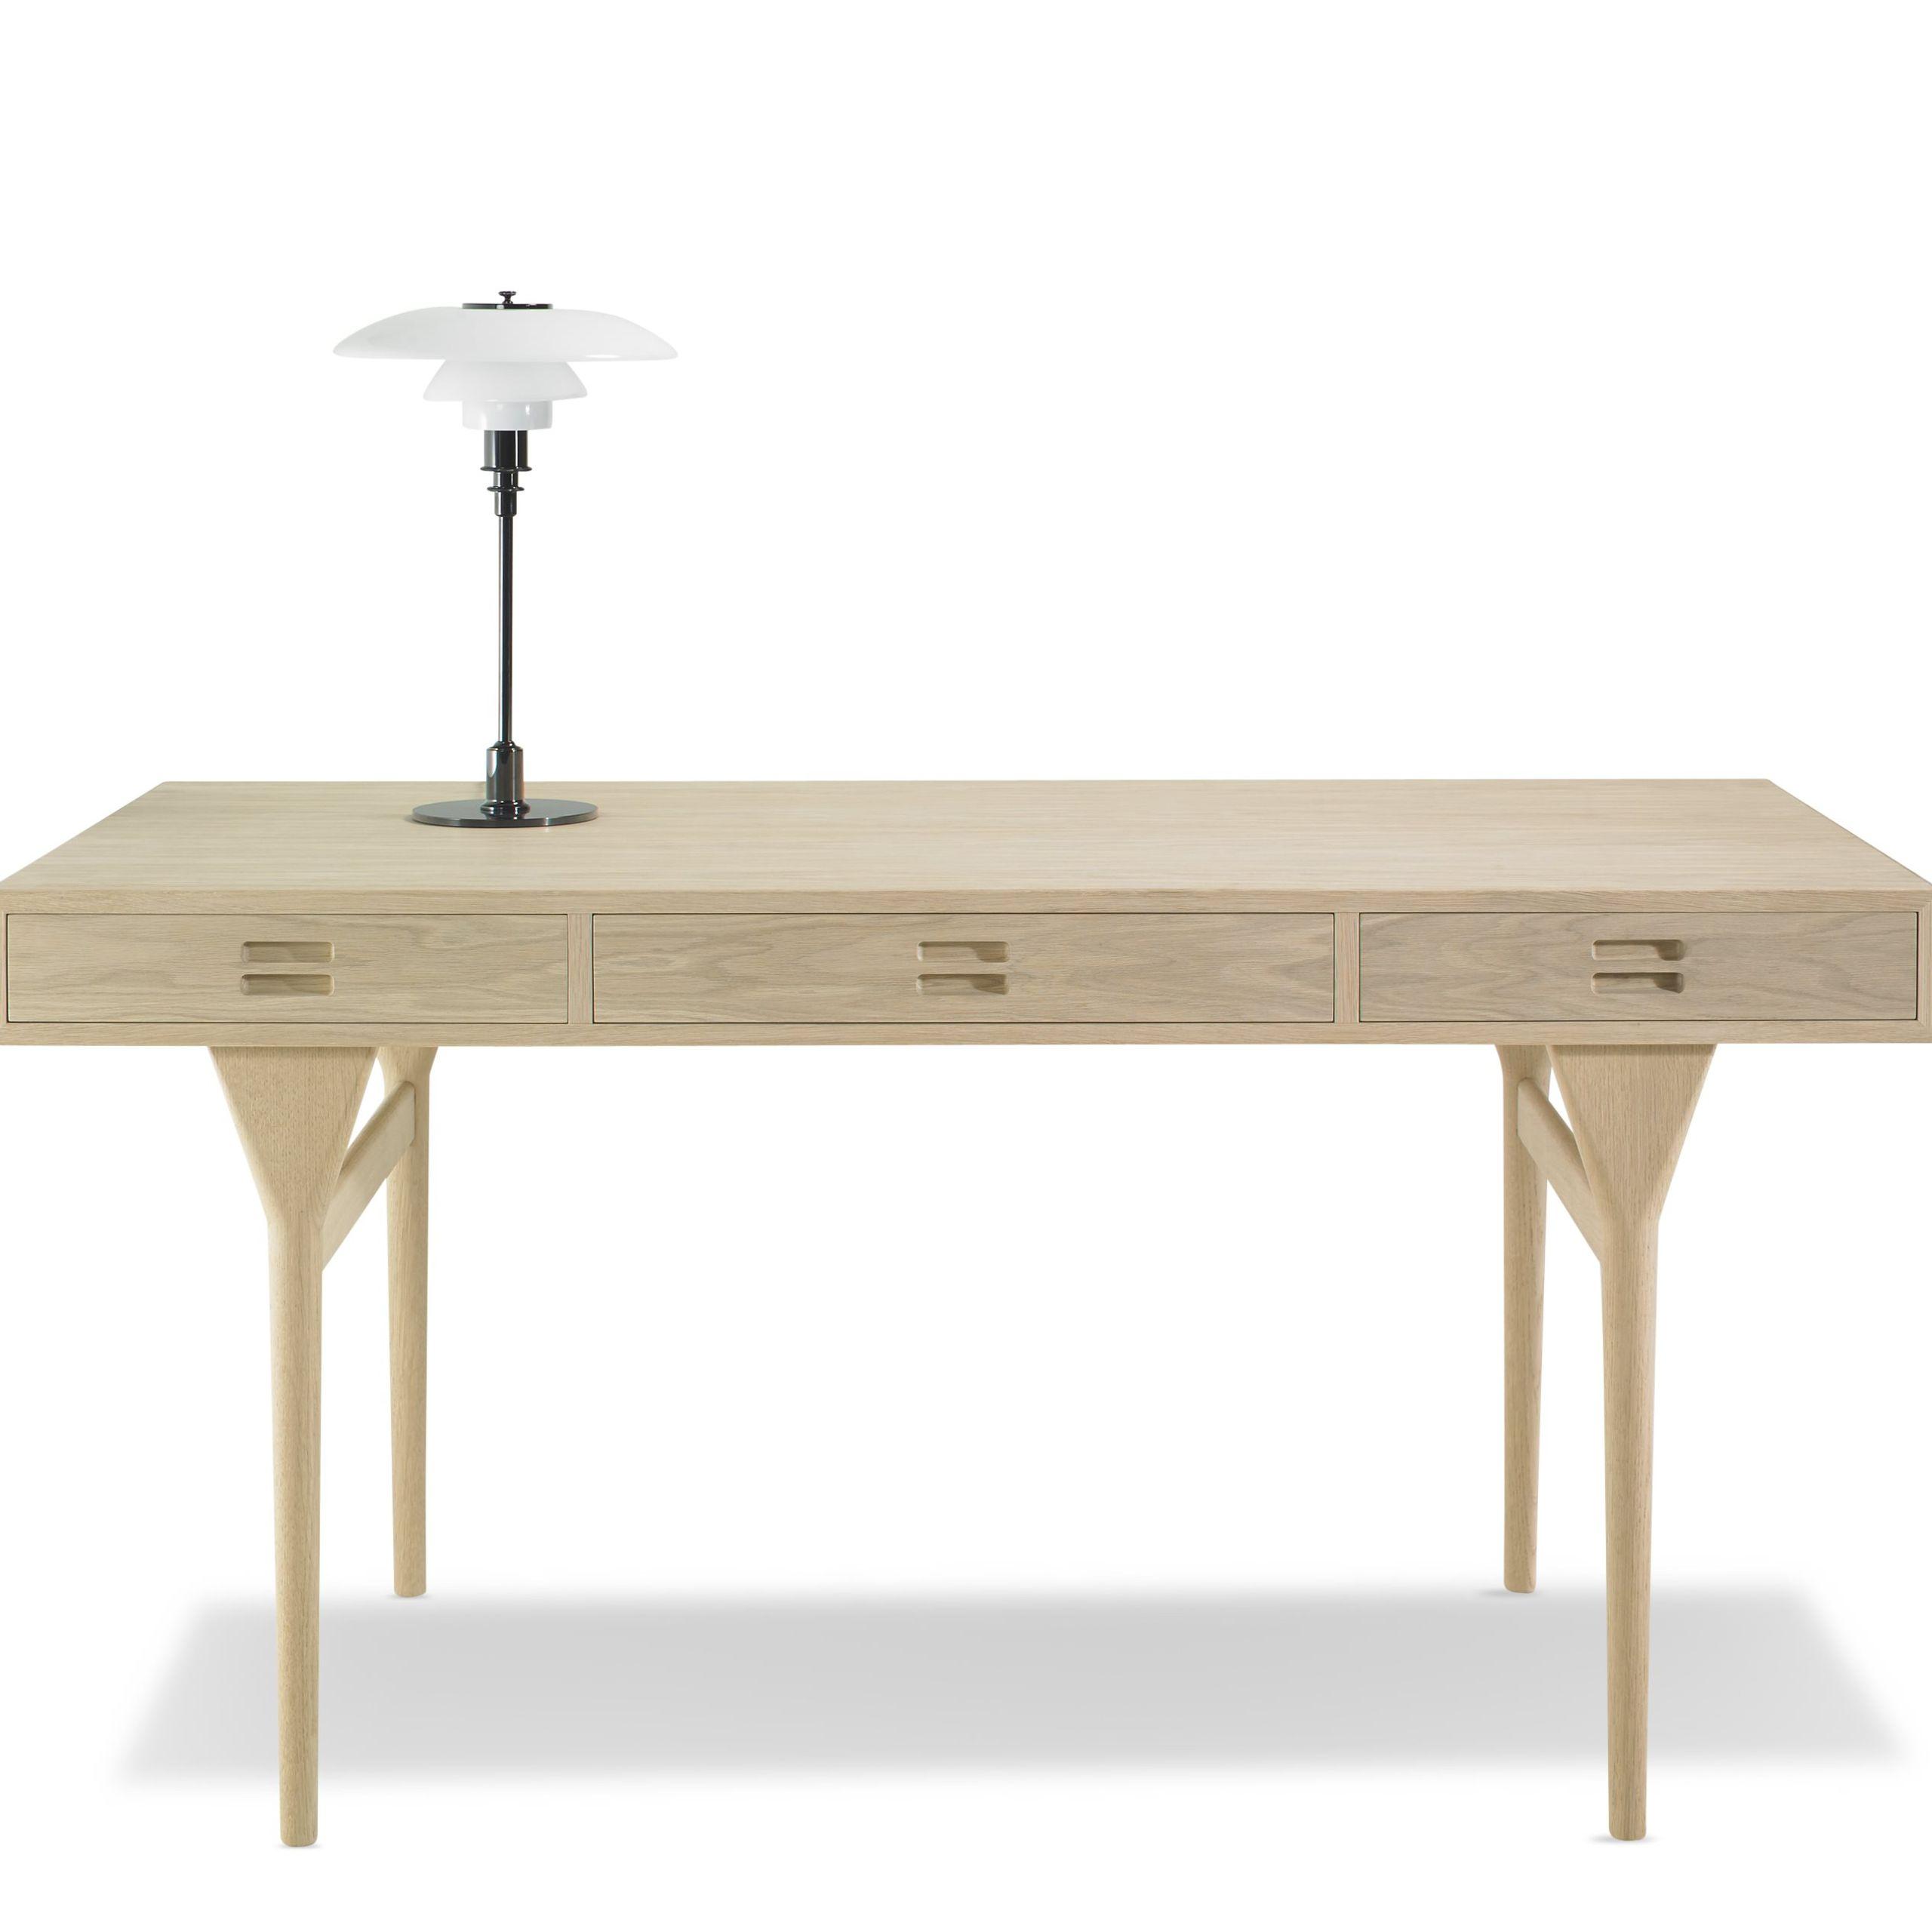 Ultra ND93 Skrivebord - Skrivebord - Snedkergaarden QE15